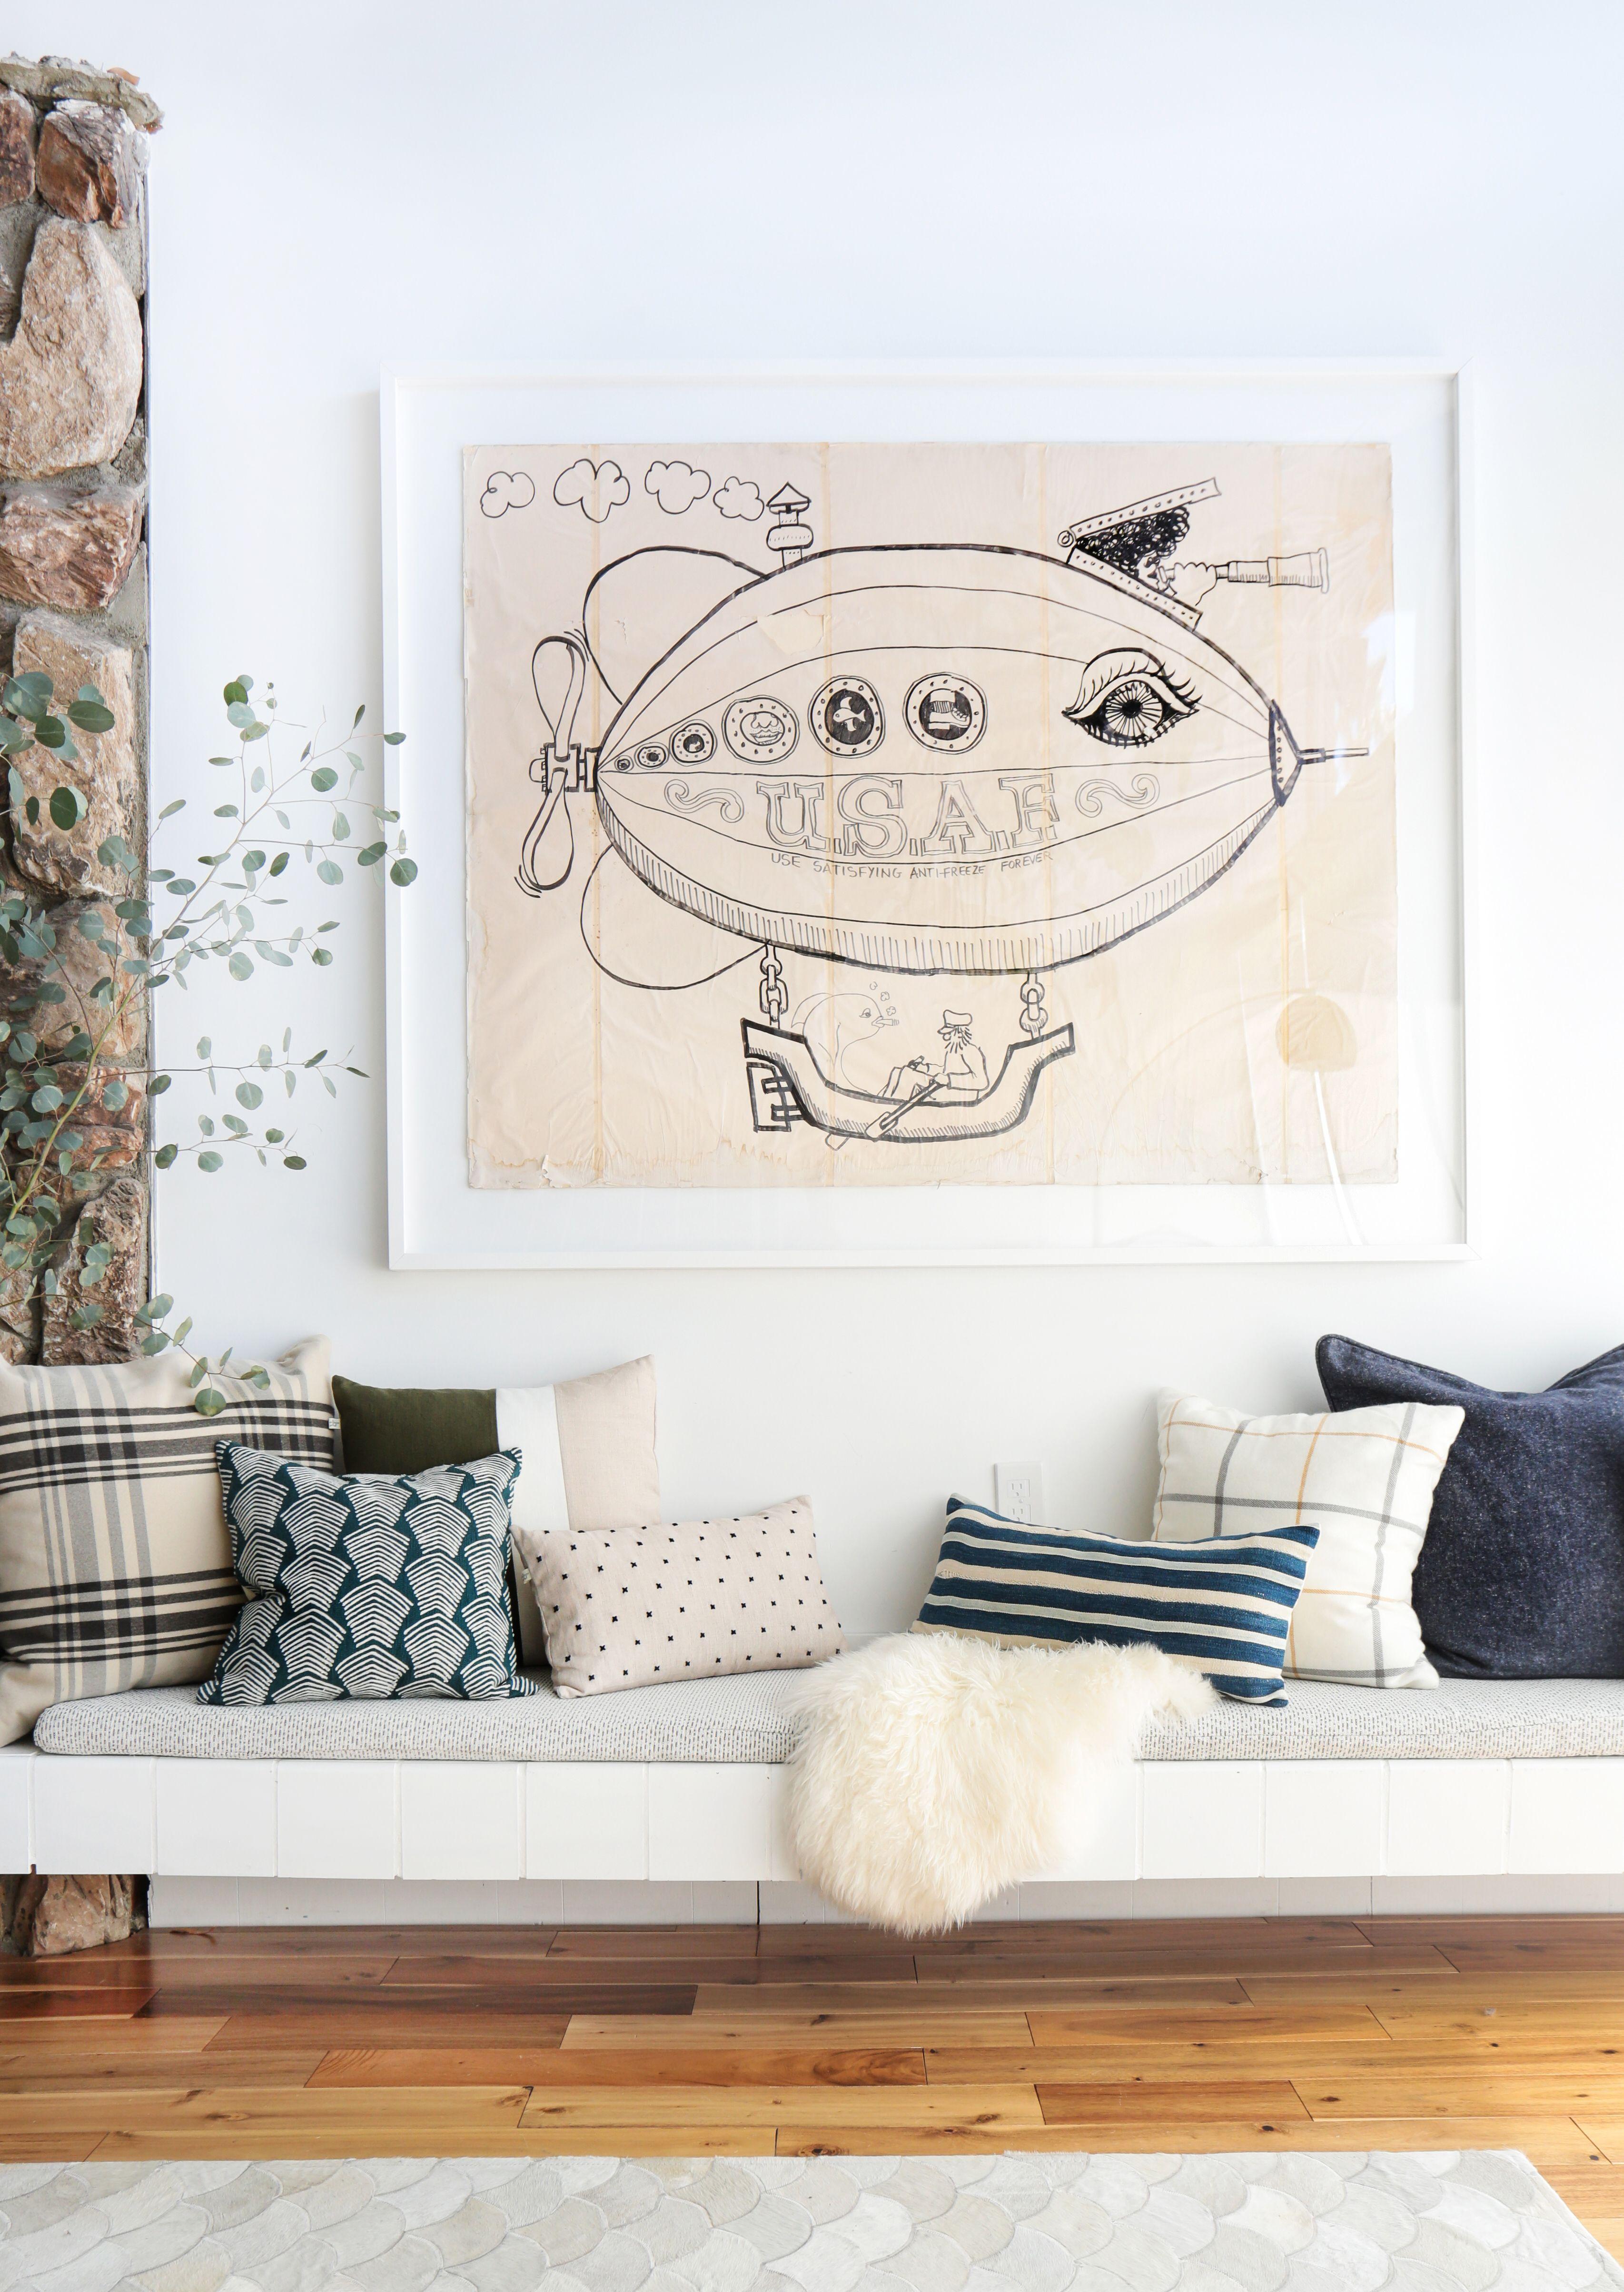 Superb Oversized Art For Living Room Part - 12: Bench Seat + Oversized Art Via @citysage